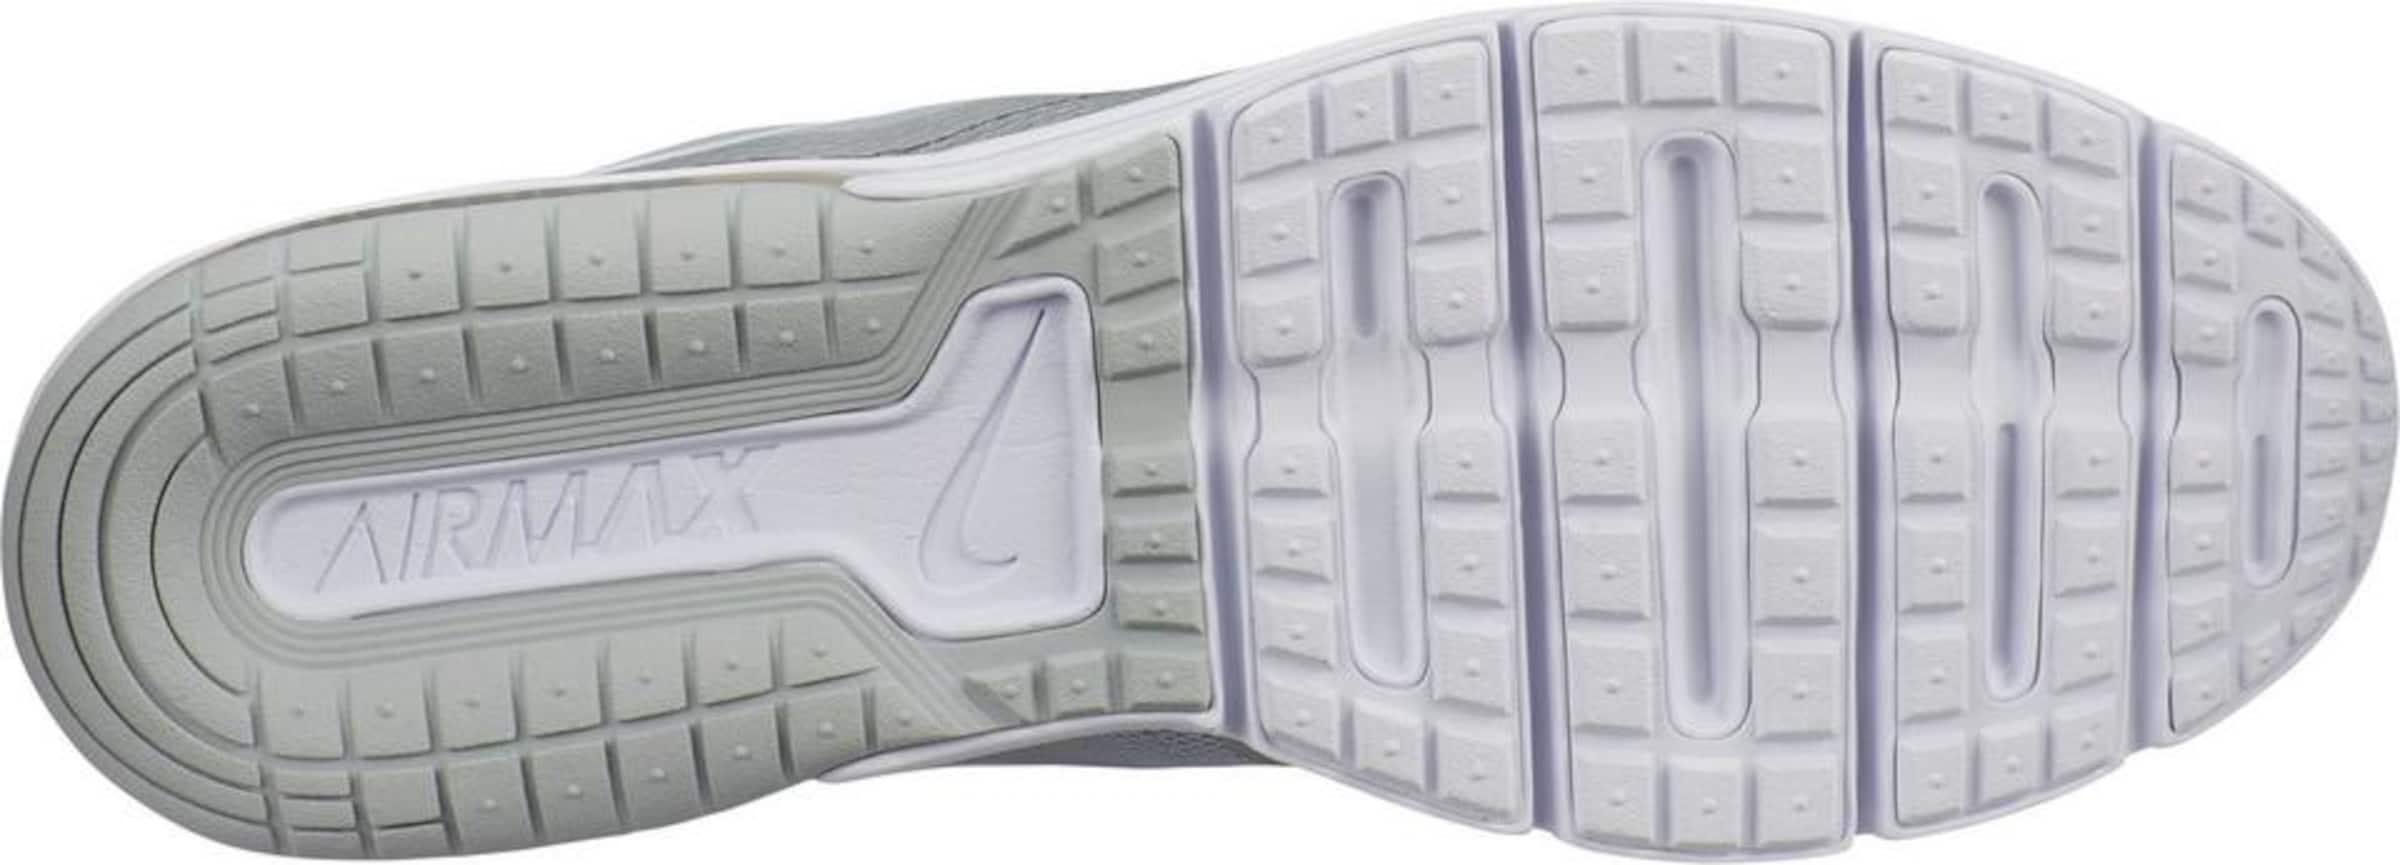 Silbergrau Nike Sneaker Max 5' 'air Sequent In Sportswear 4 USqzMVp